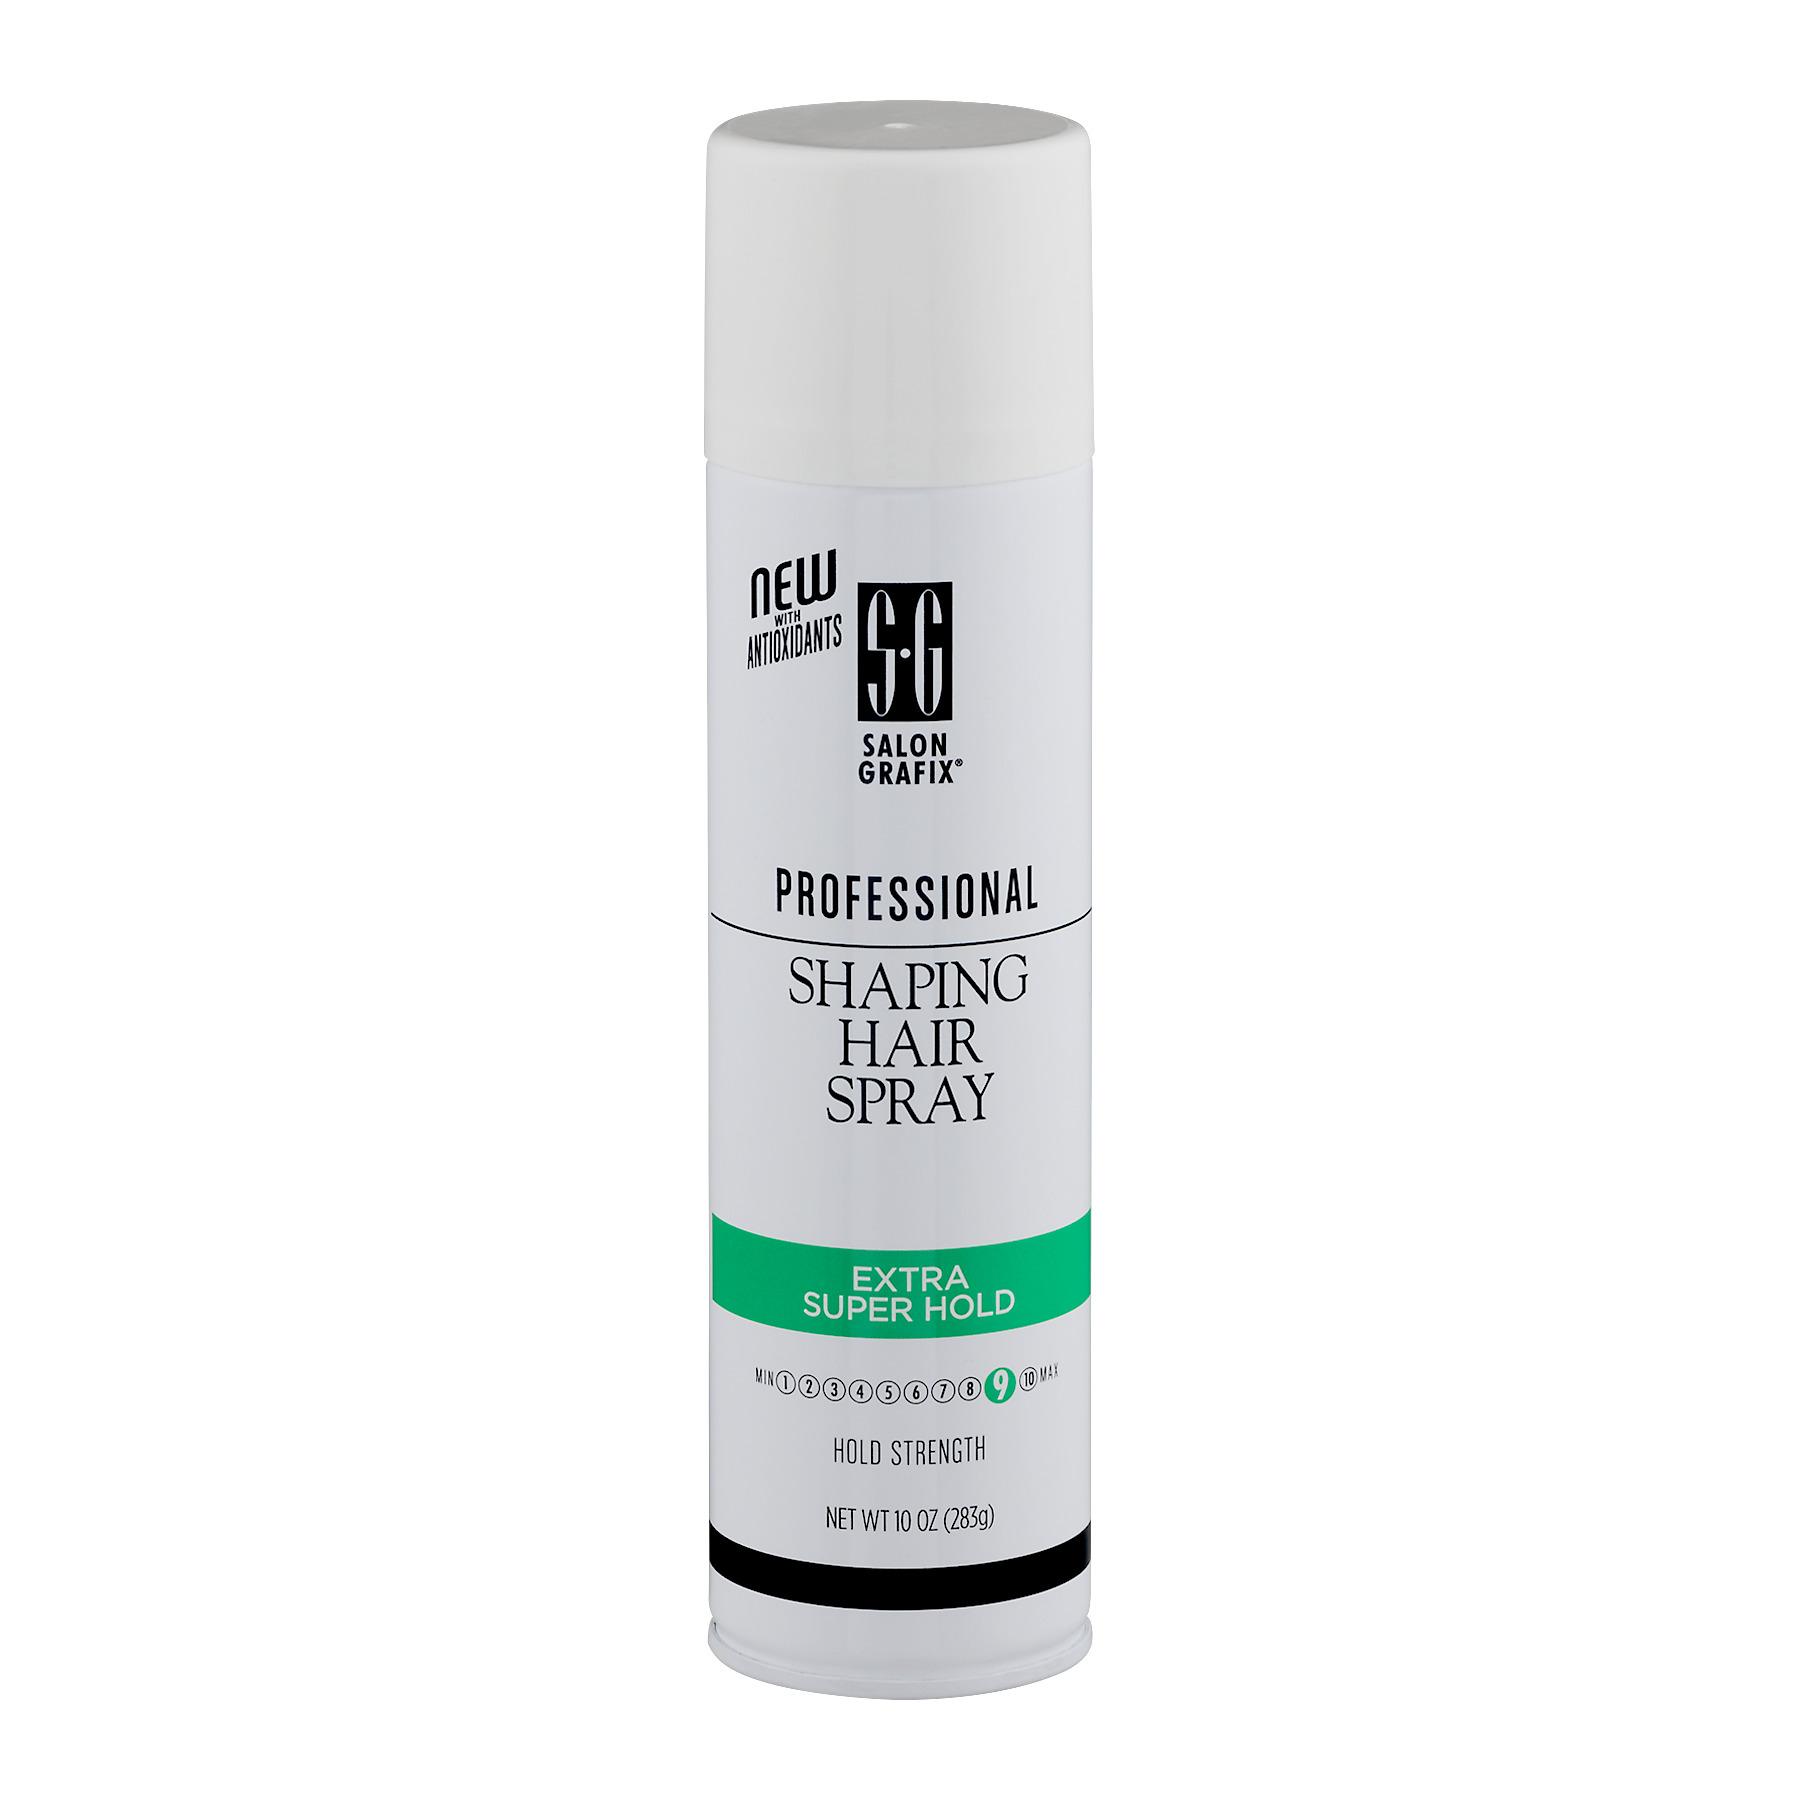 Salon Grafix Professional Shaping Hair Spray Extra Super